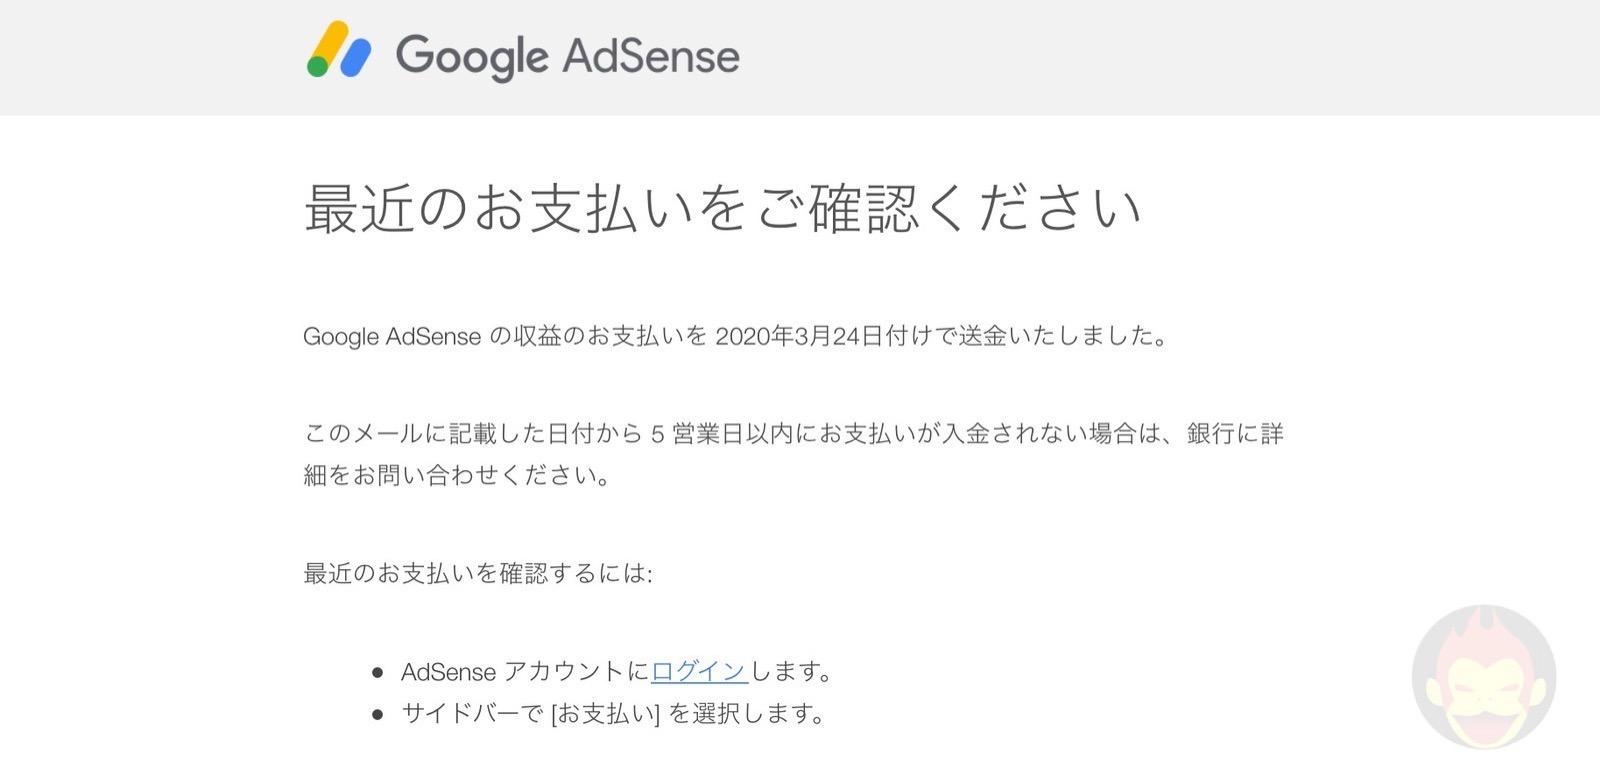 Google AdSense trouble 02